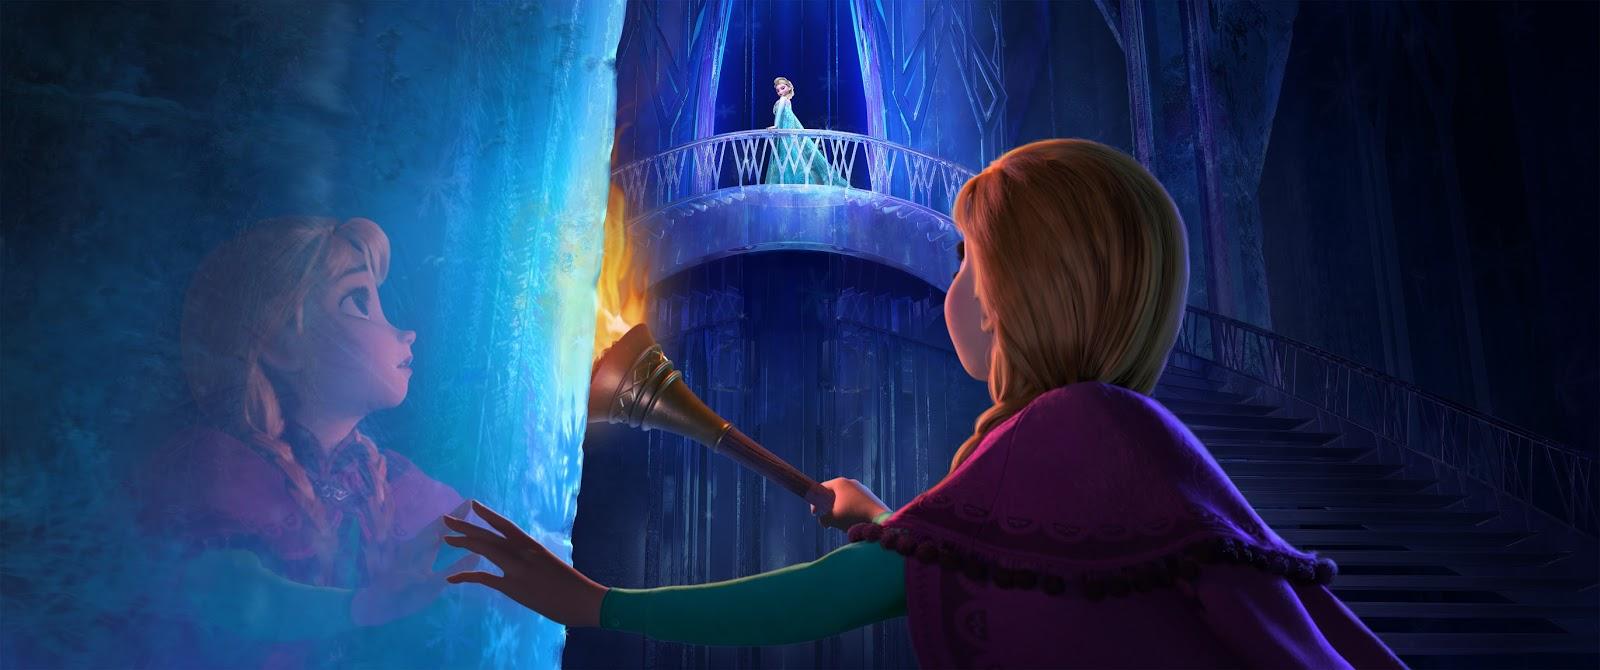 Anna_Elsa_Frozen